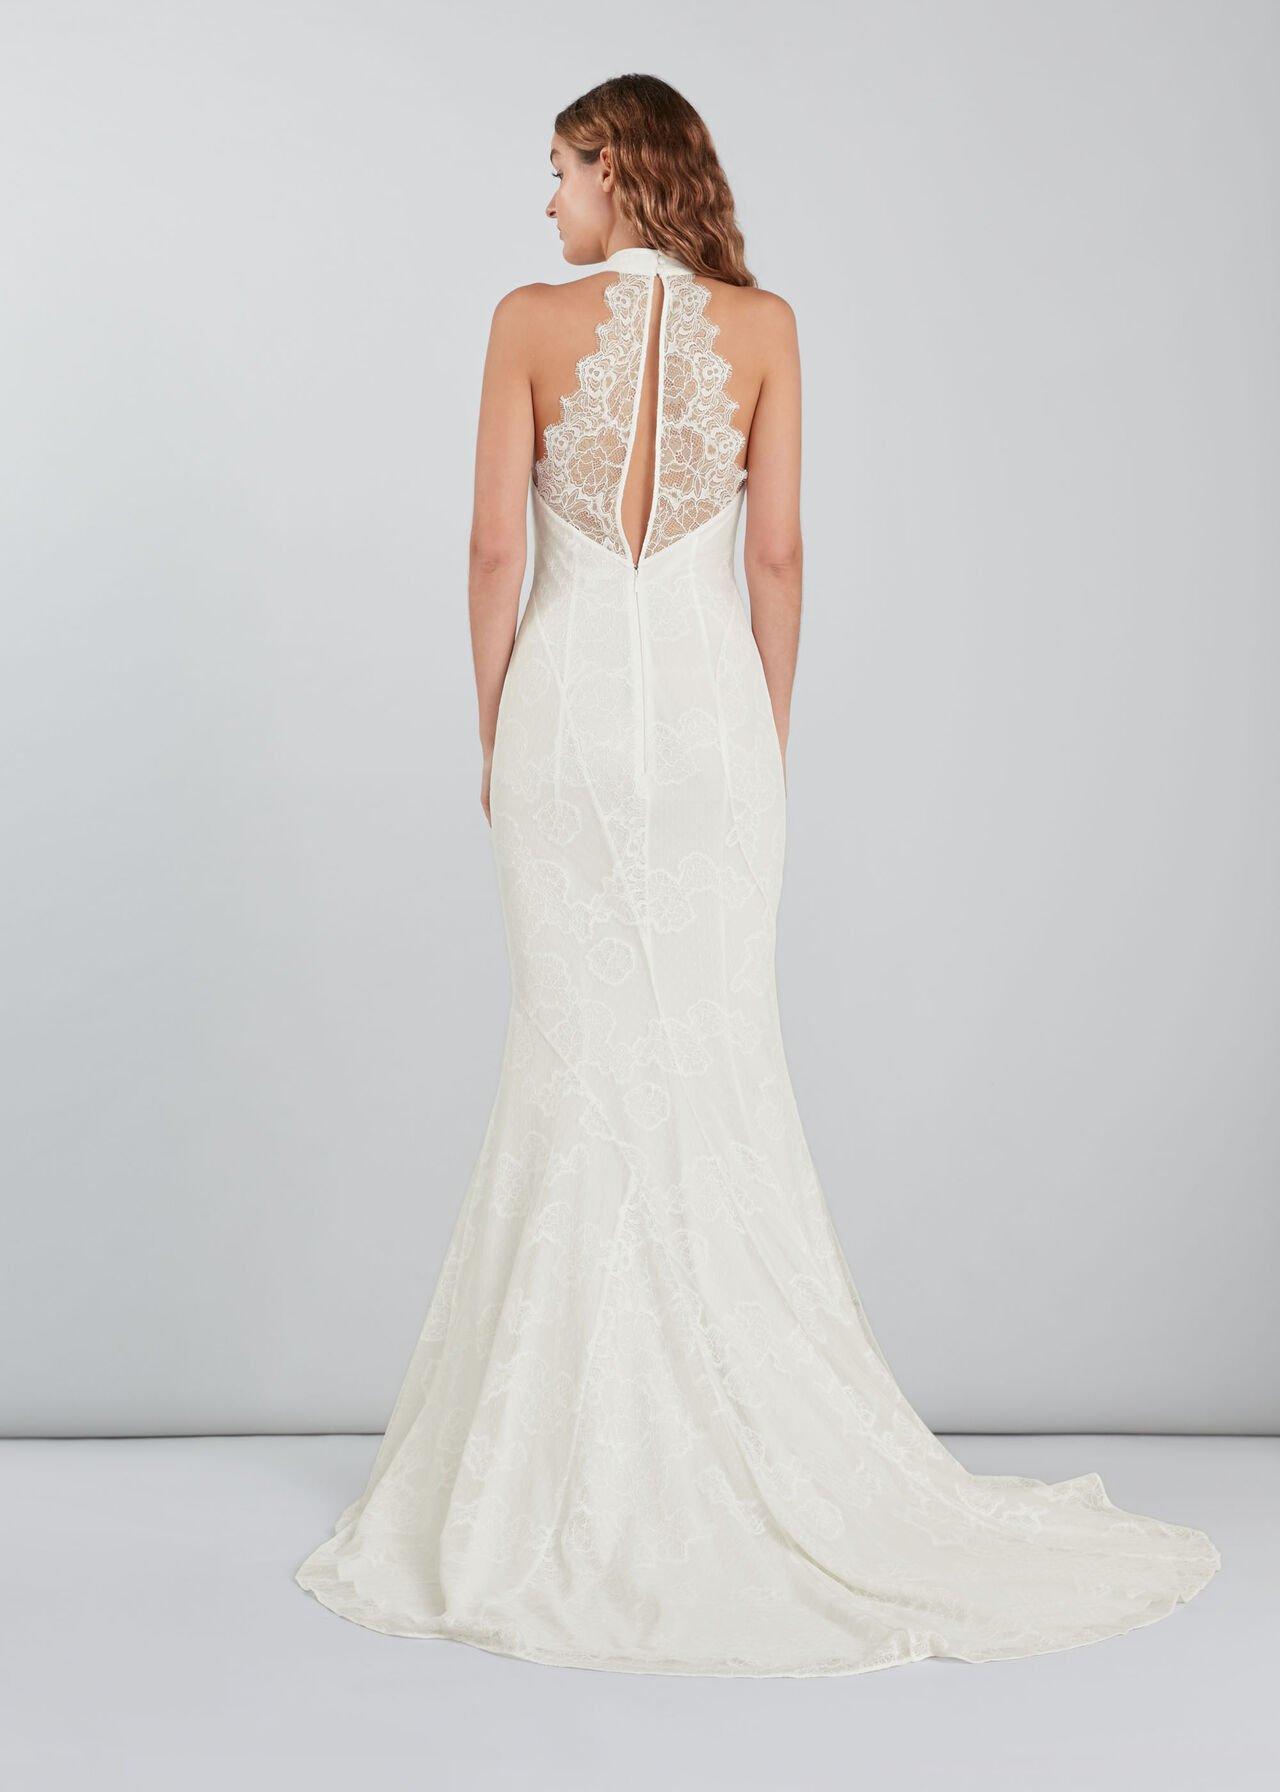 Maria Halter Wedding Dress Ivory